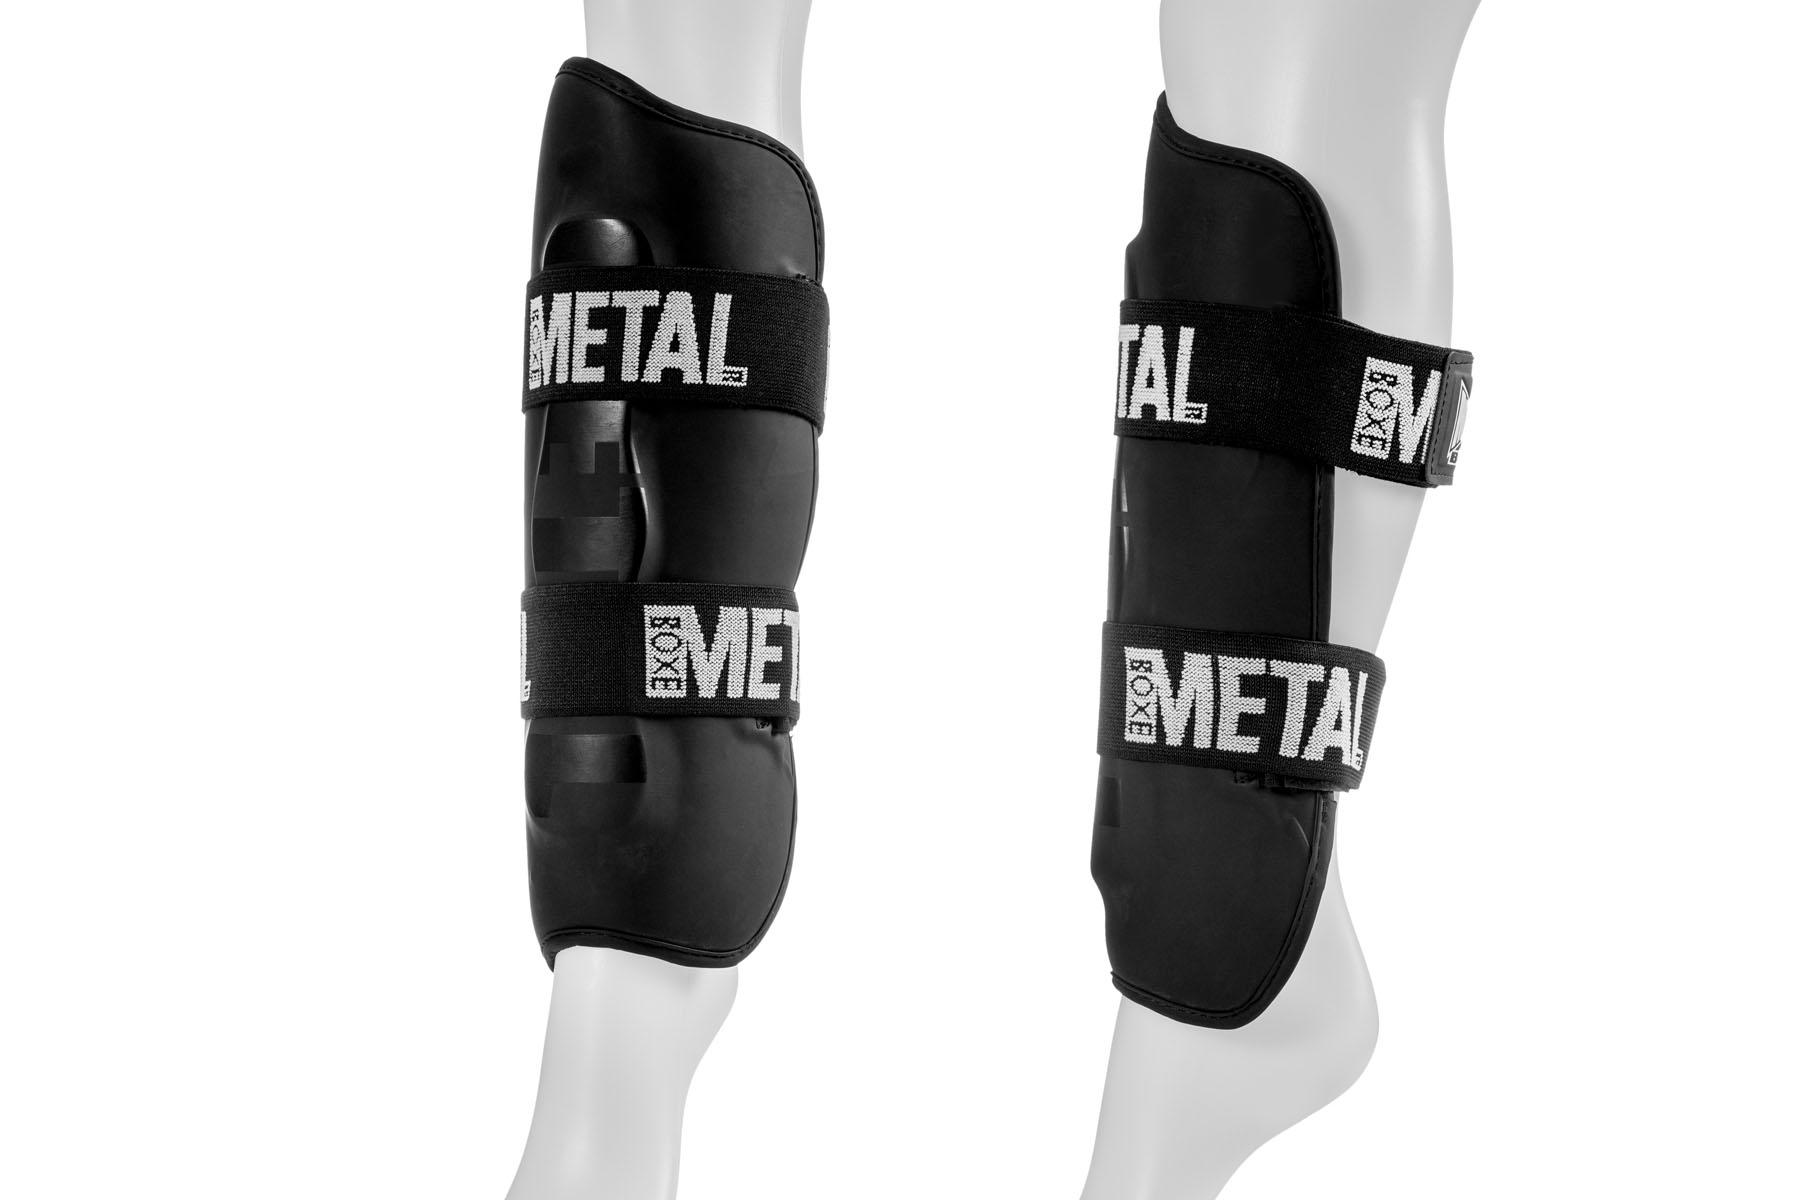 Protège Tibias (Protège Pieds Ajoutable), Metal Boxe MB211